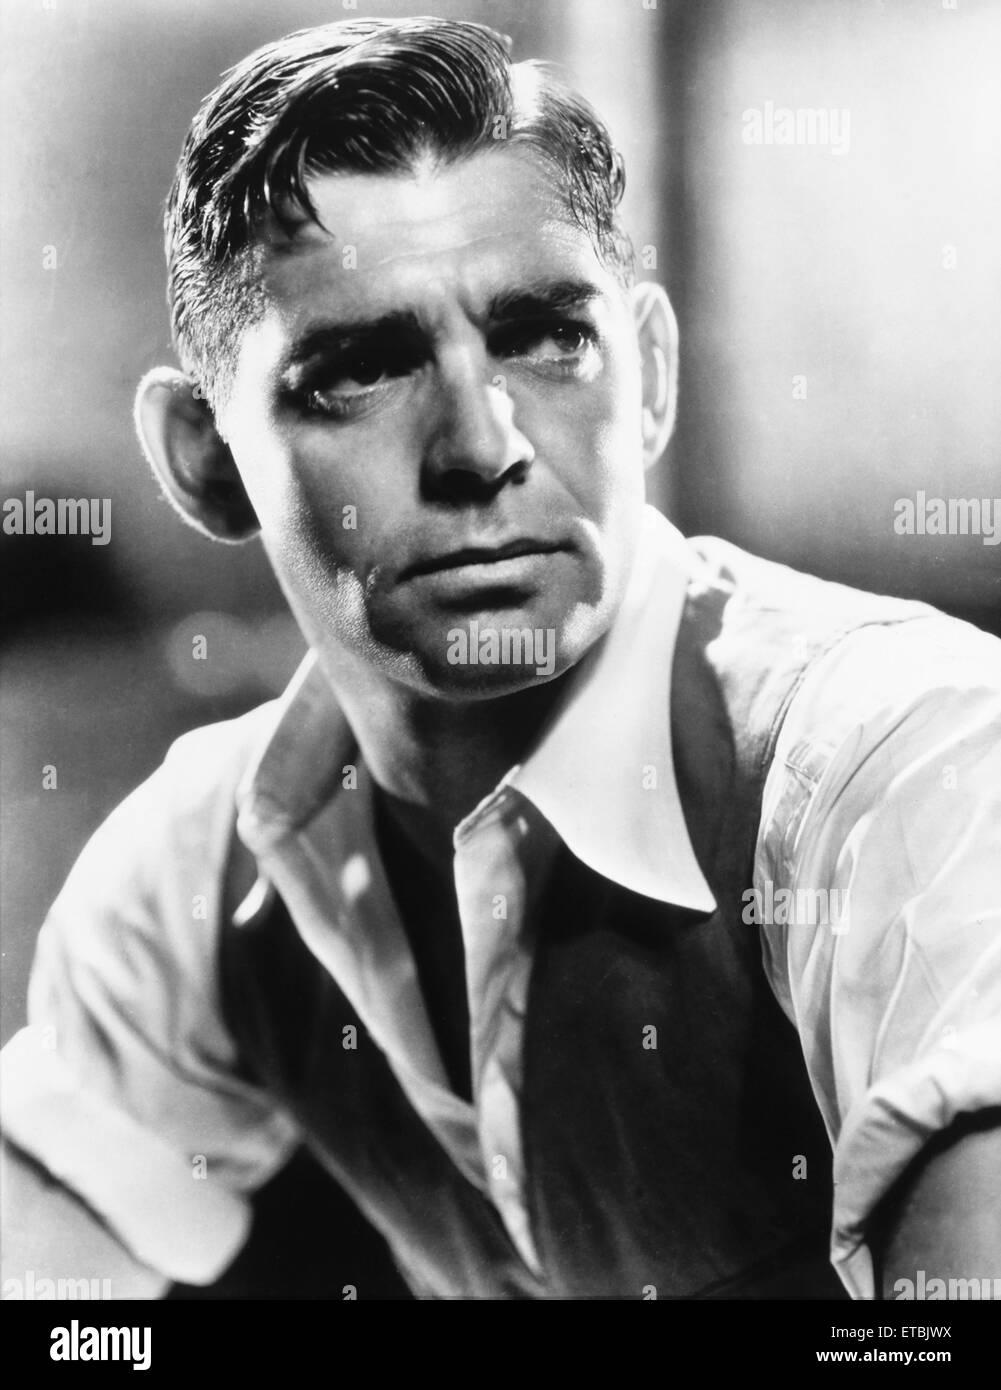 Clark Gable, Portrait, on-set of the Film 'Red Dust', 1932 - Stock Image